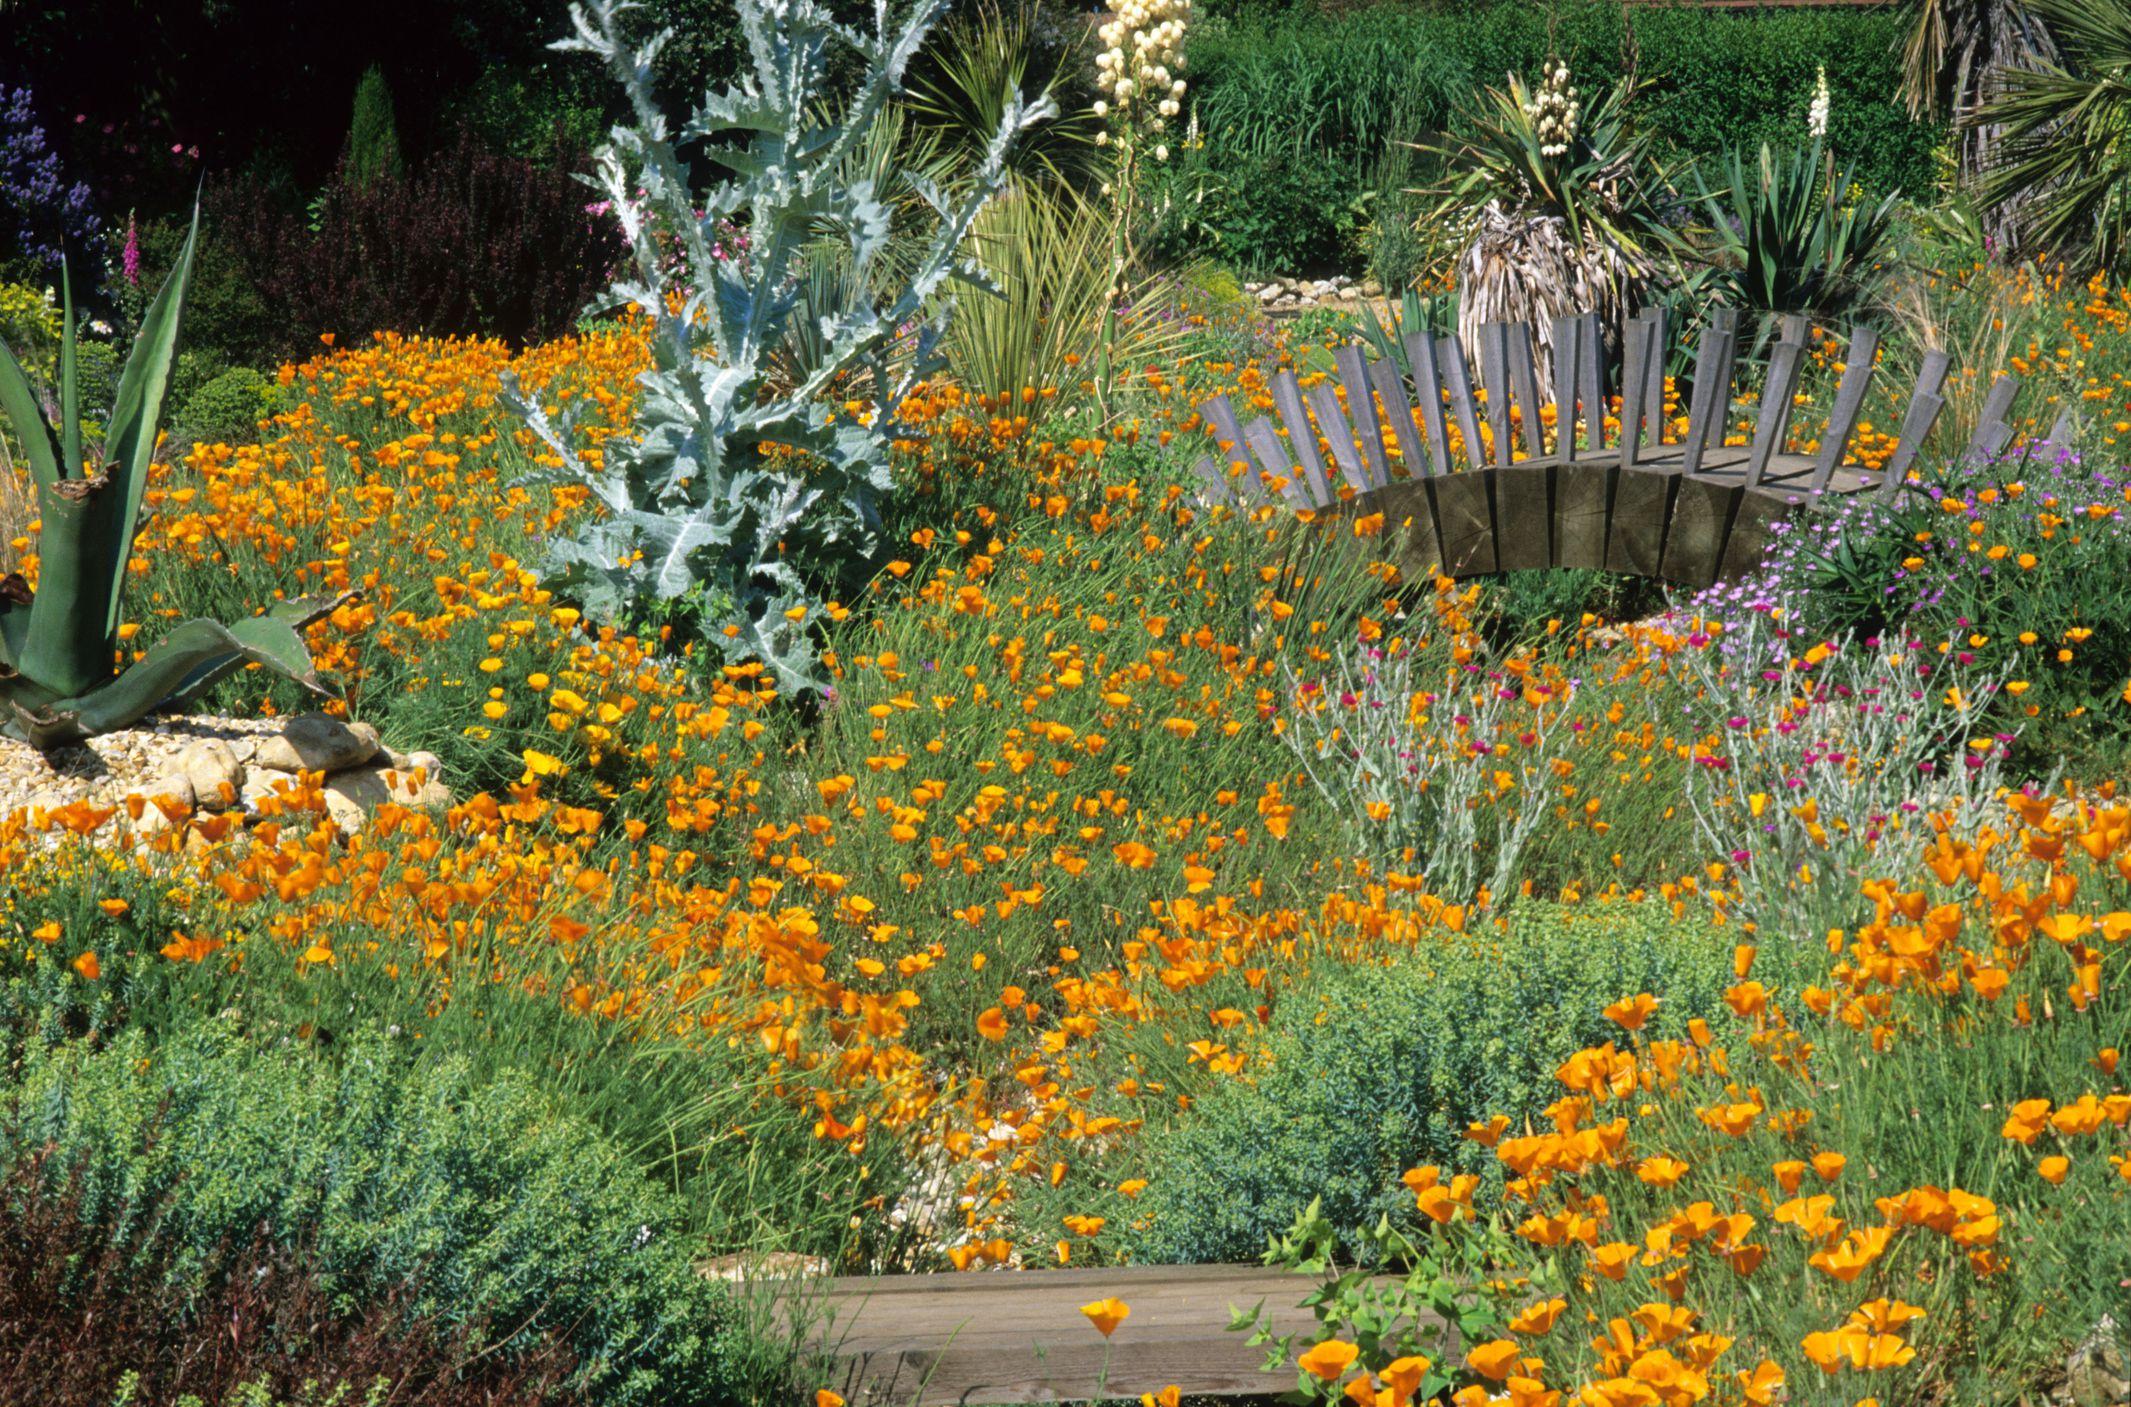 Yellow Poppies (Meconopsis cambrica